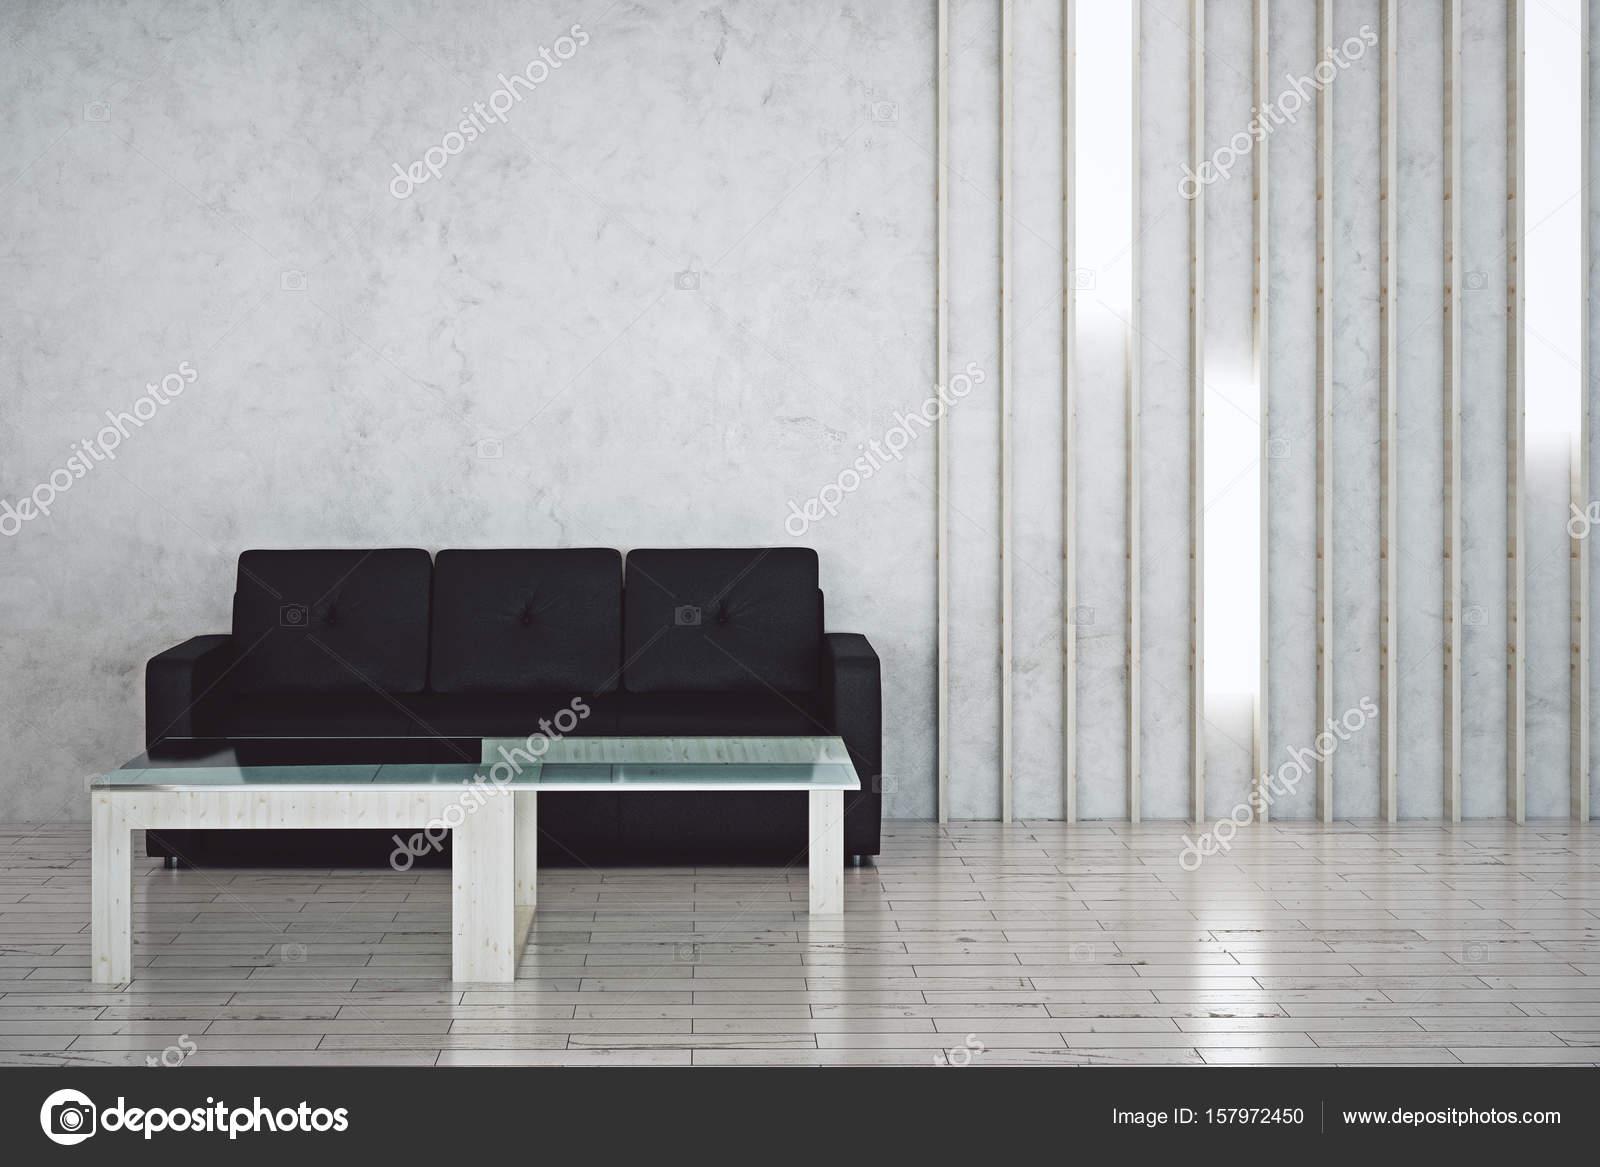 Fine Interior With Blank Wall Stock Photo C Peshkova 157972450 Machost Co Dining Chair Design Ideas Machostcouk